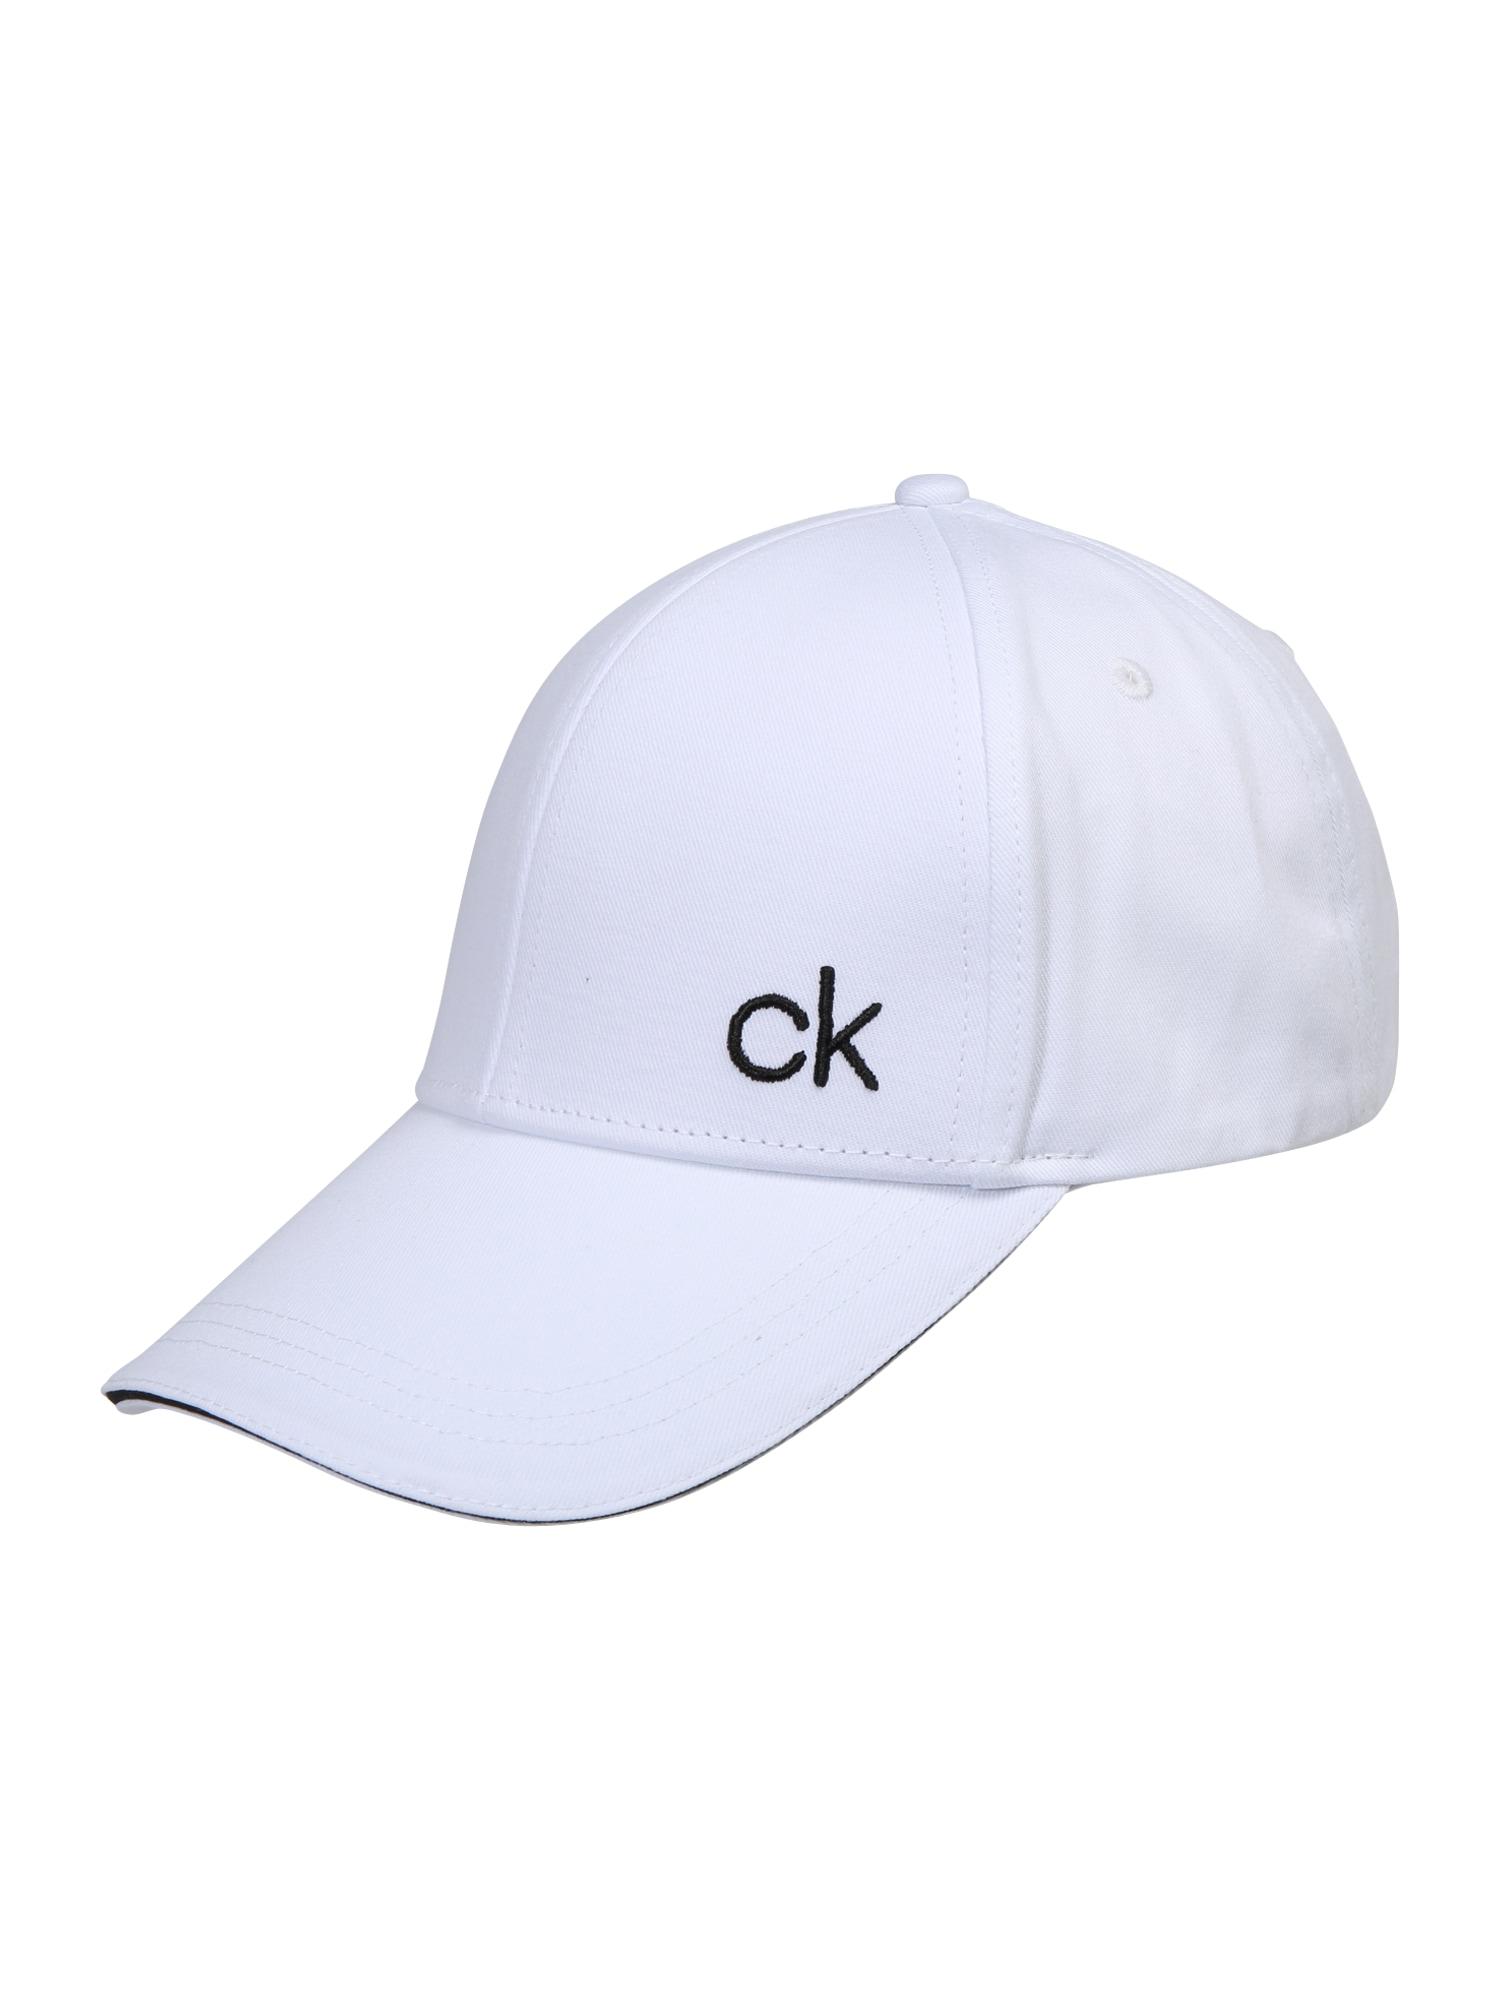 Kšiltovka CONTRATS EDGE černá bílá Calvin Klein